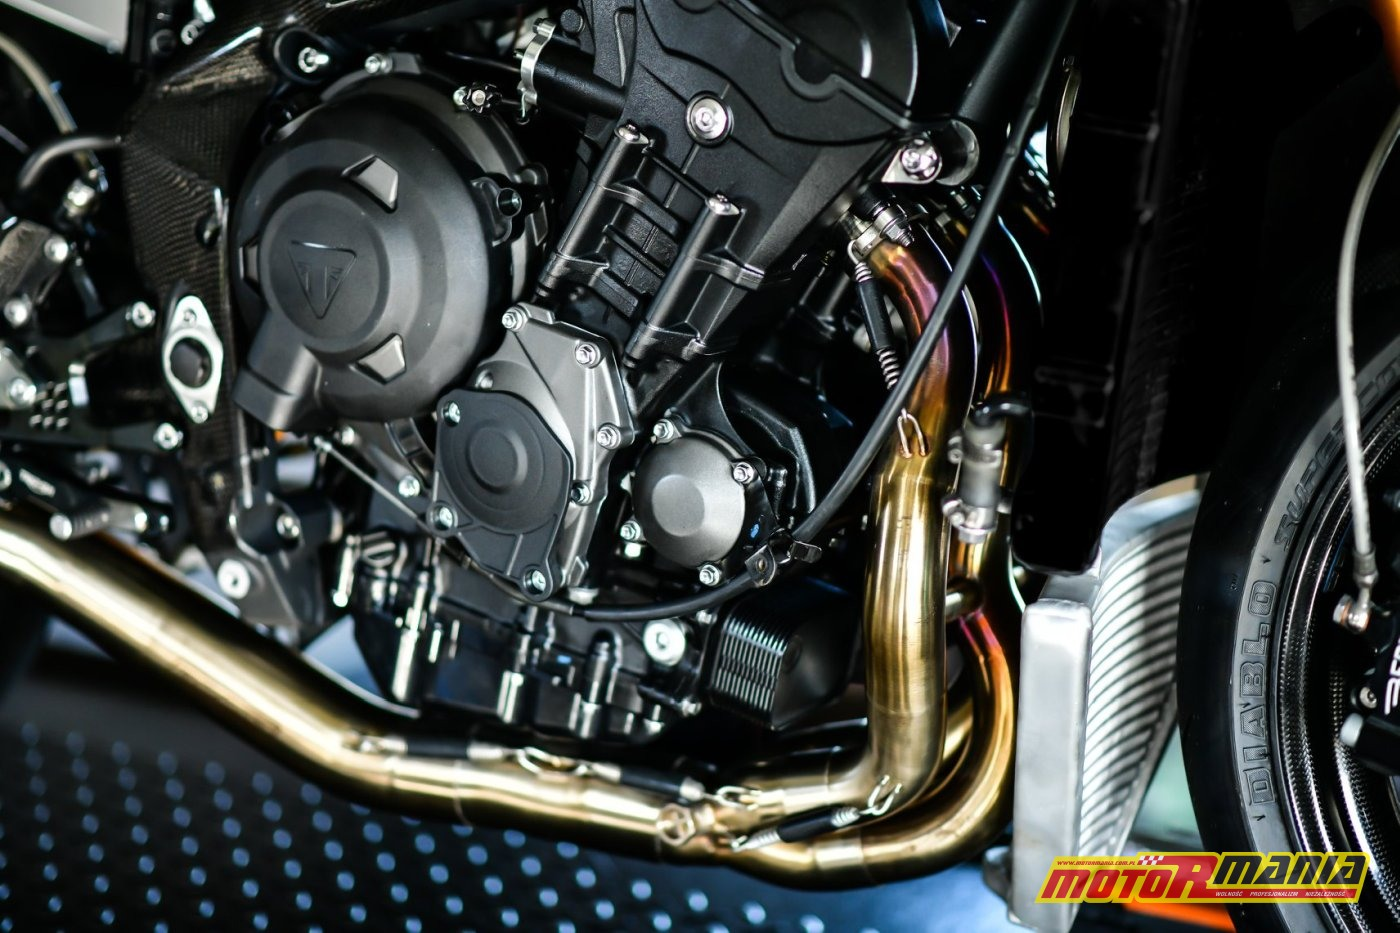 daytona 765 moto2 m-meca bike 31 (6)